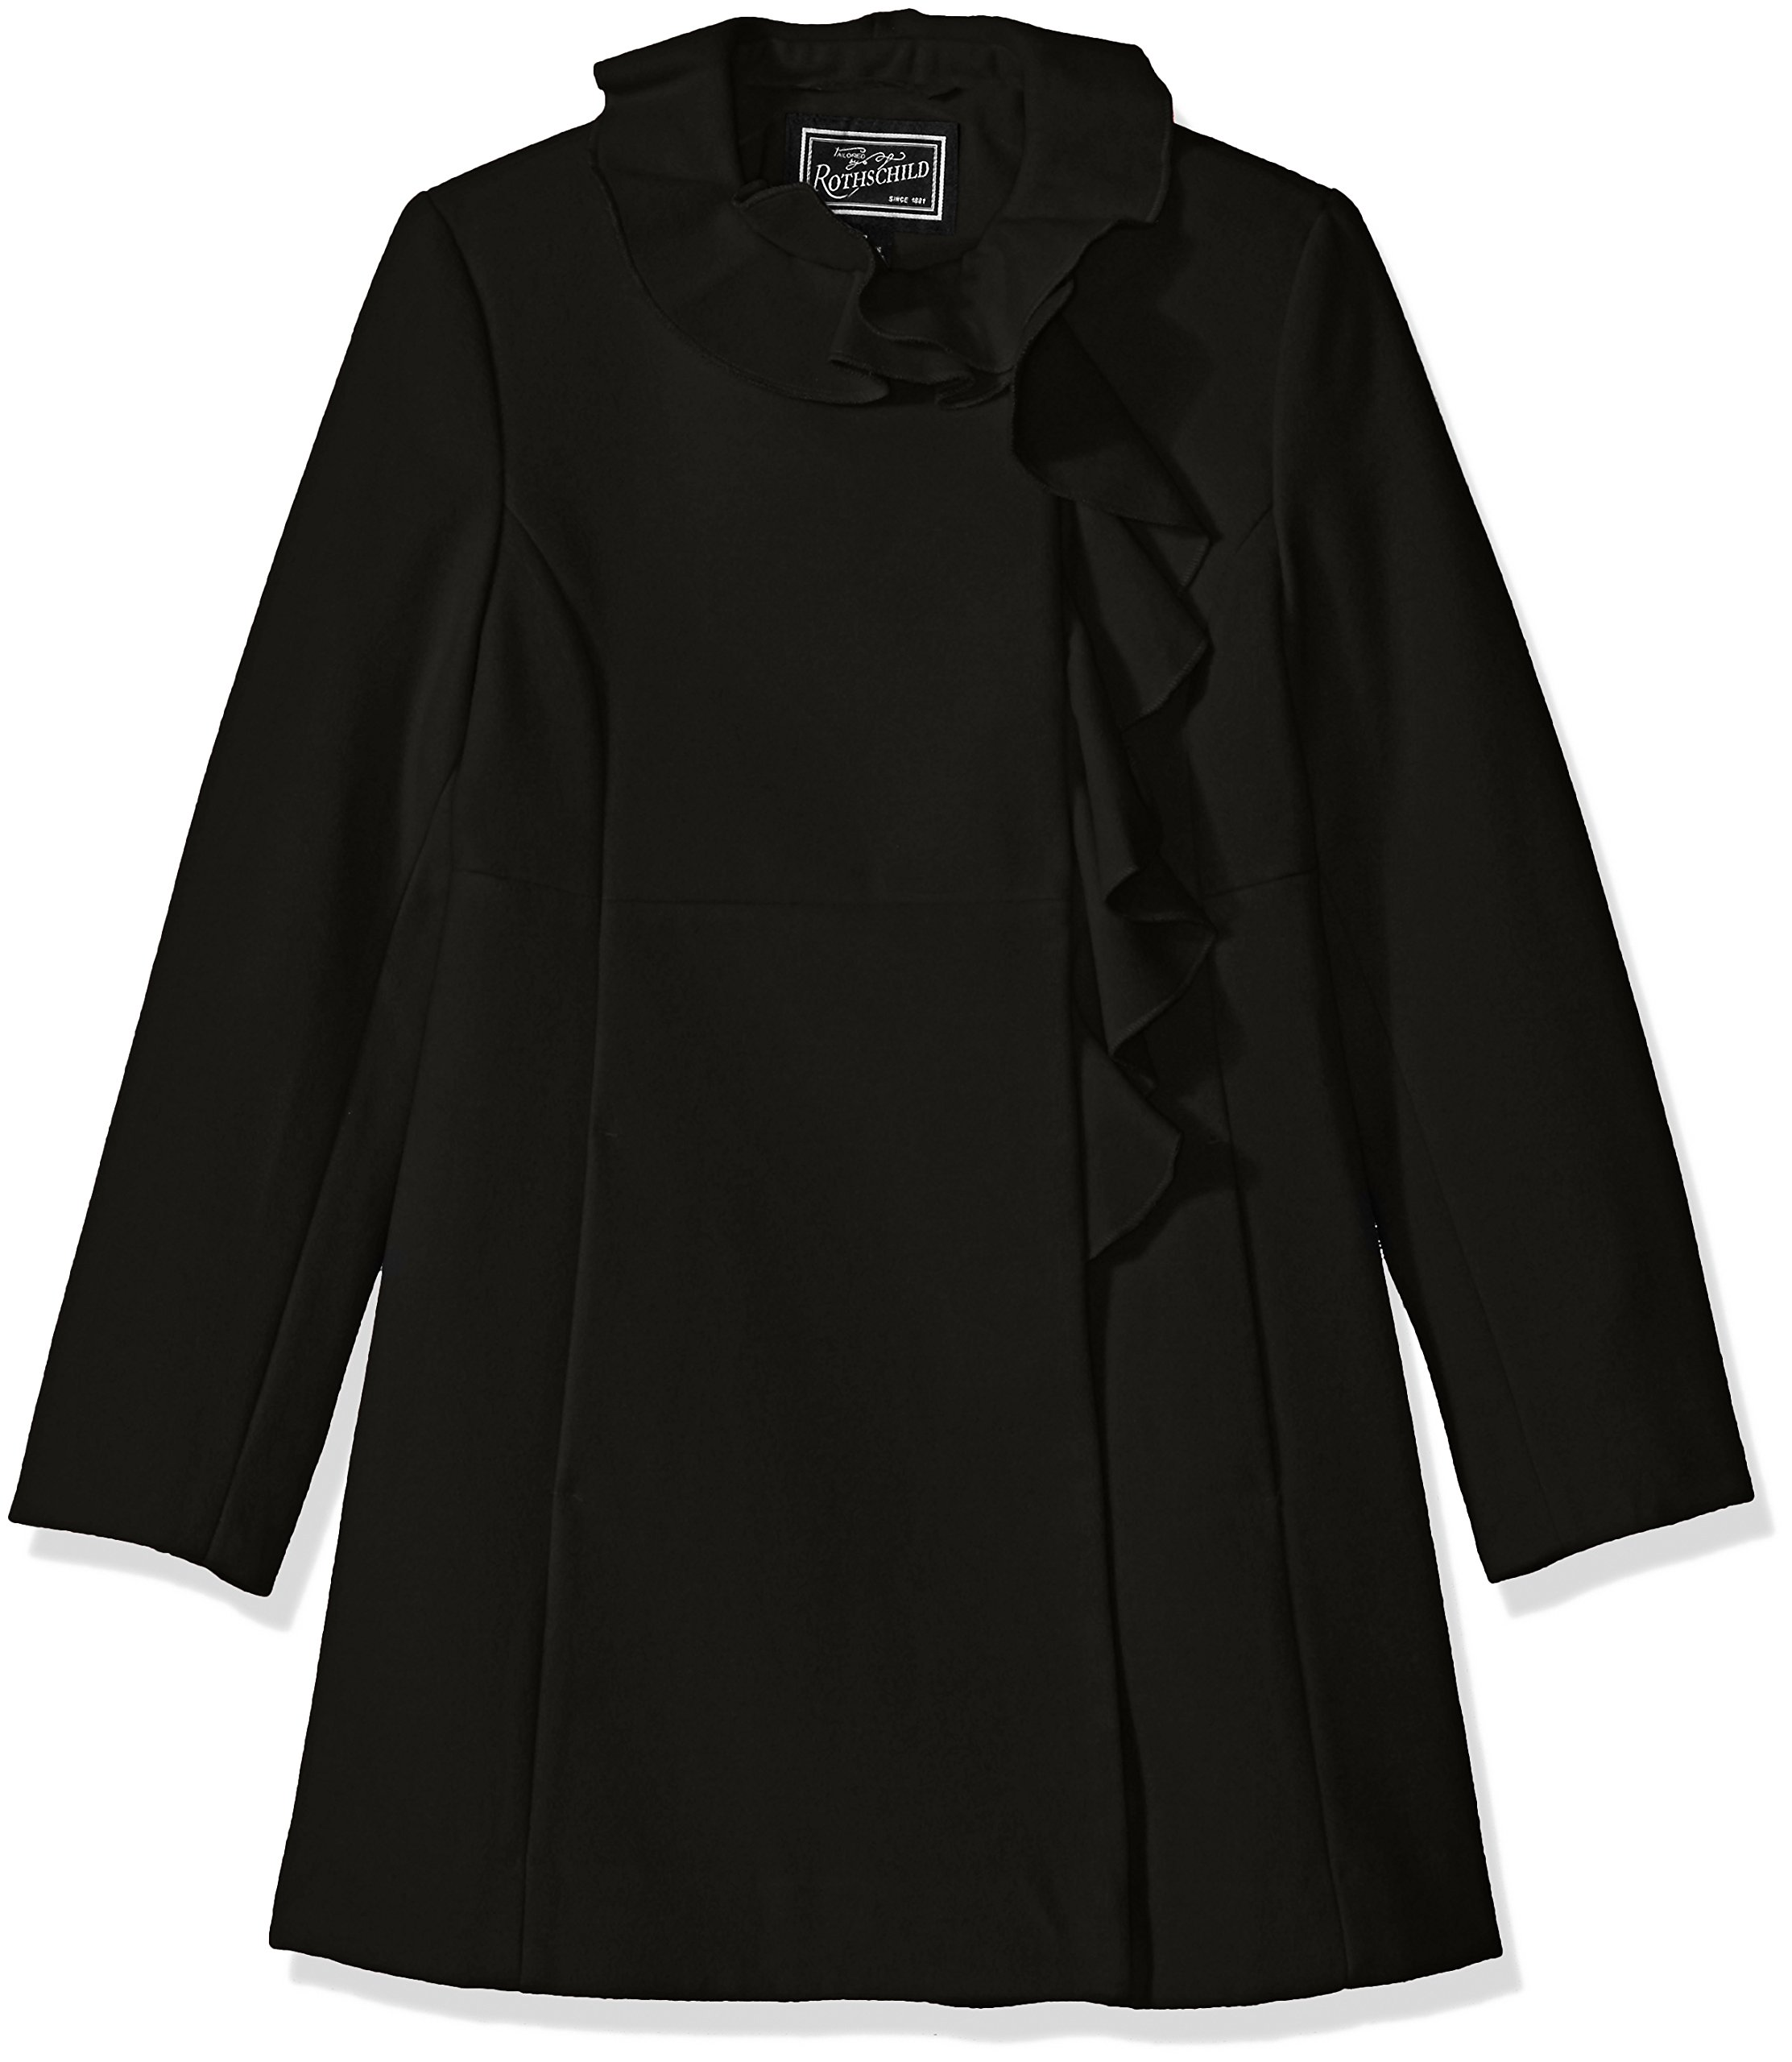 Rothschild Big Girls' Faux Wool Coat with Ruffle Trim, Black, 12